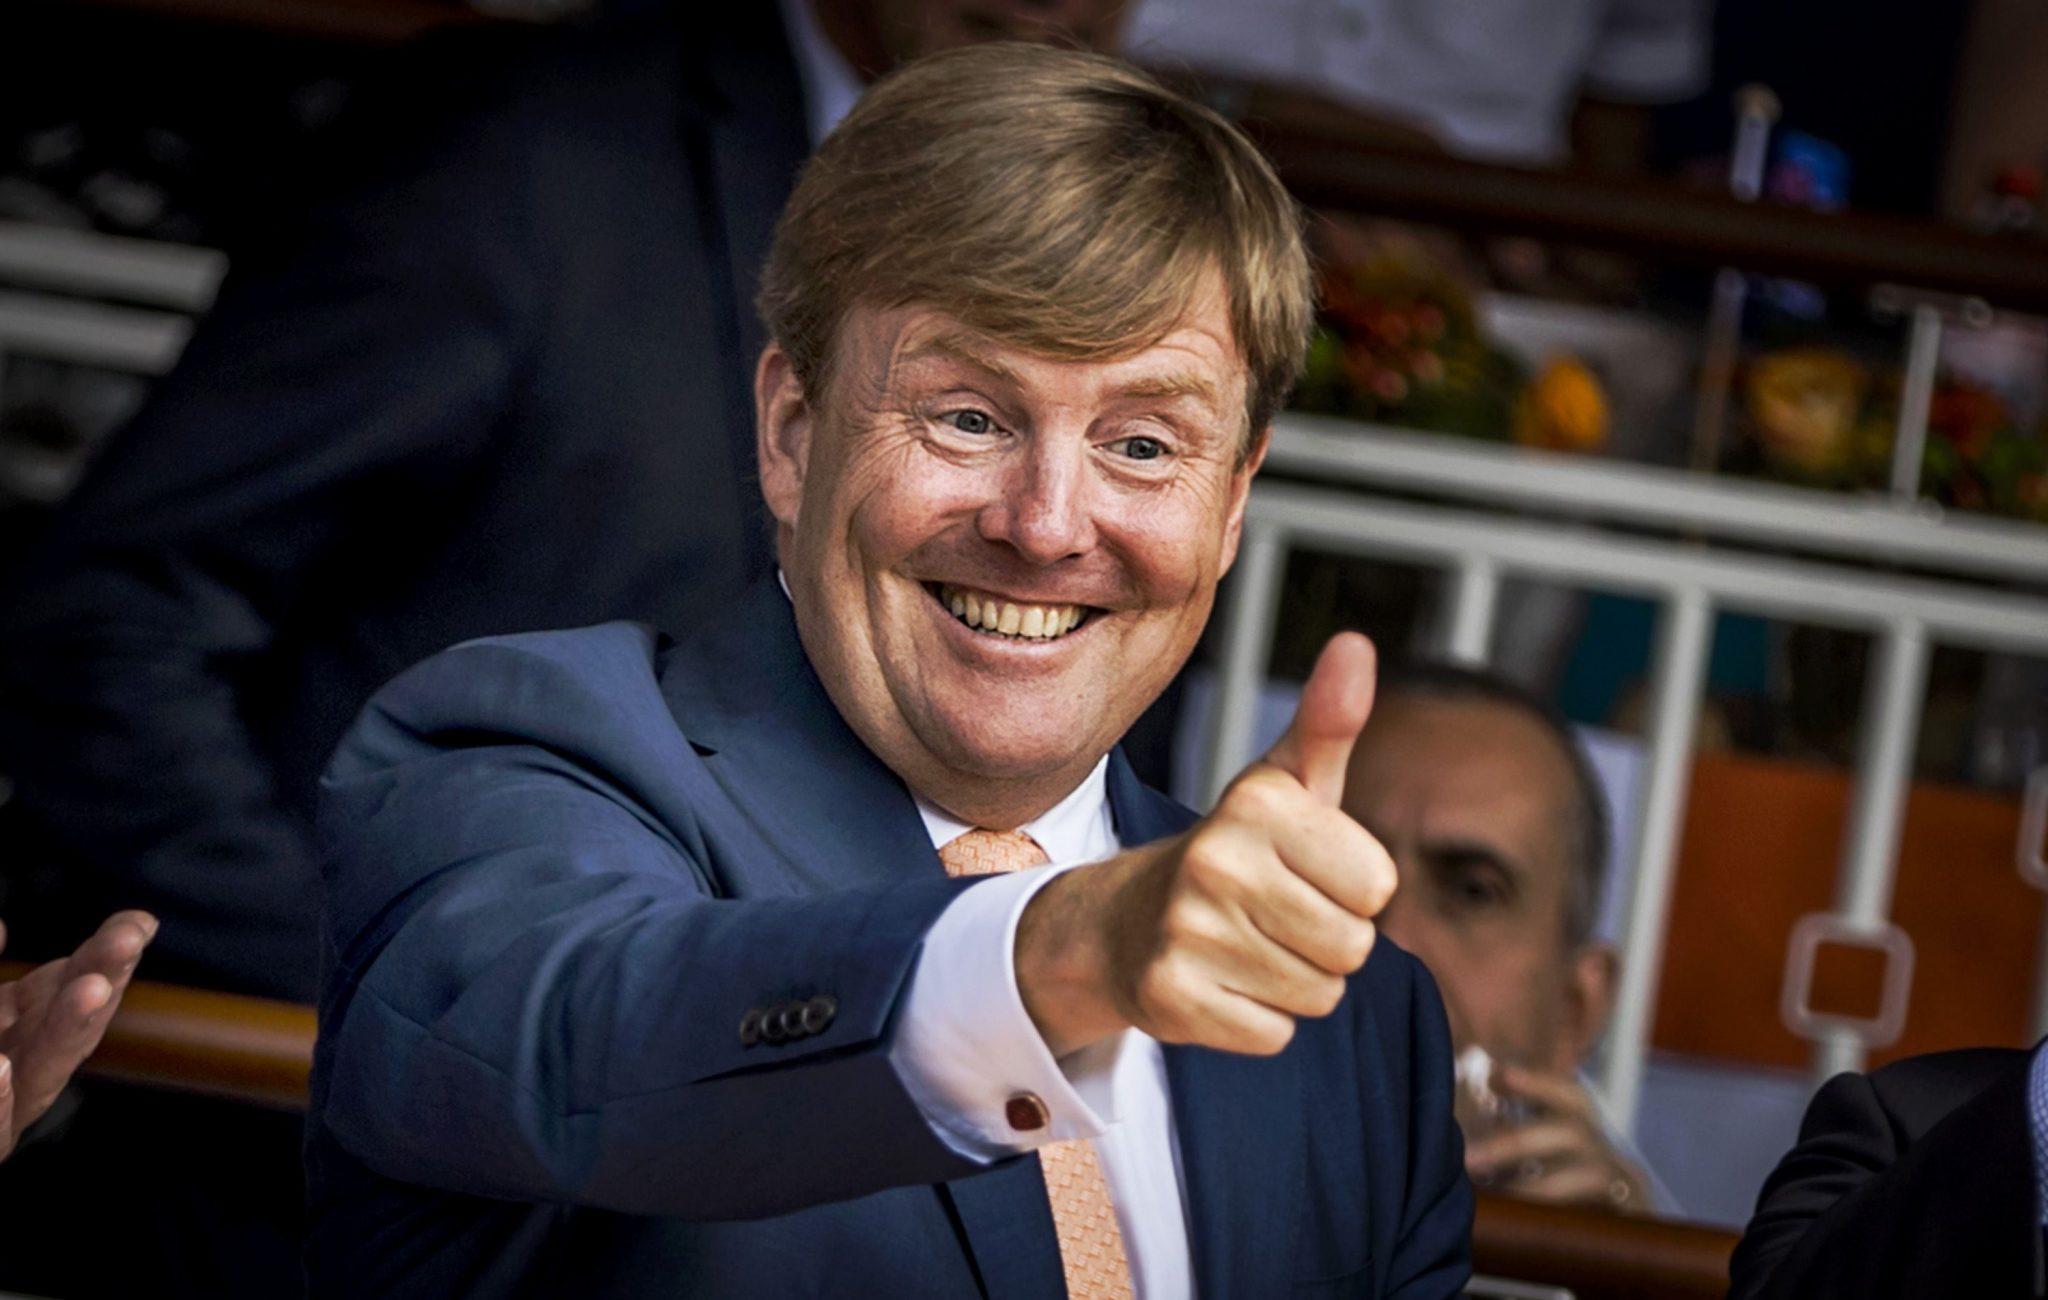 Baron Willem-Alexander